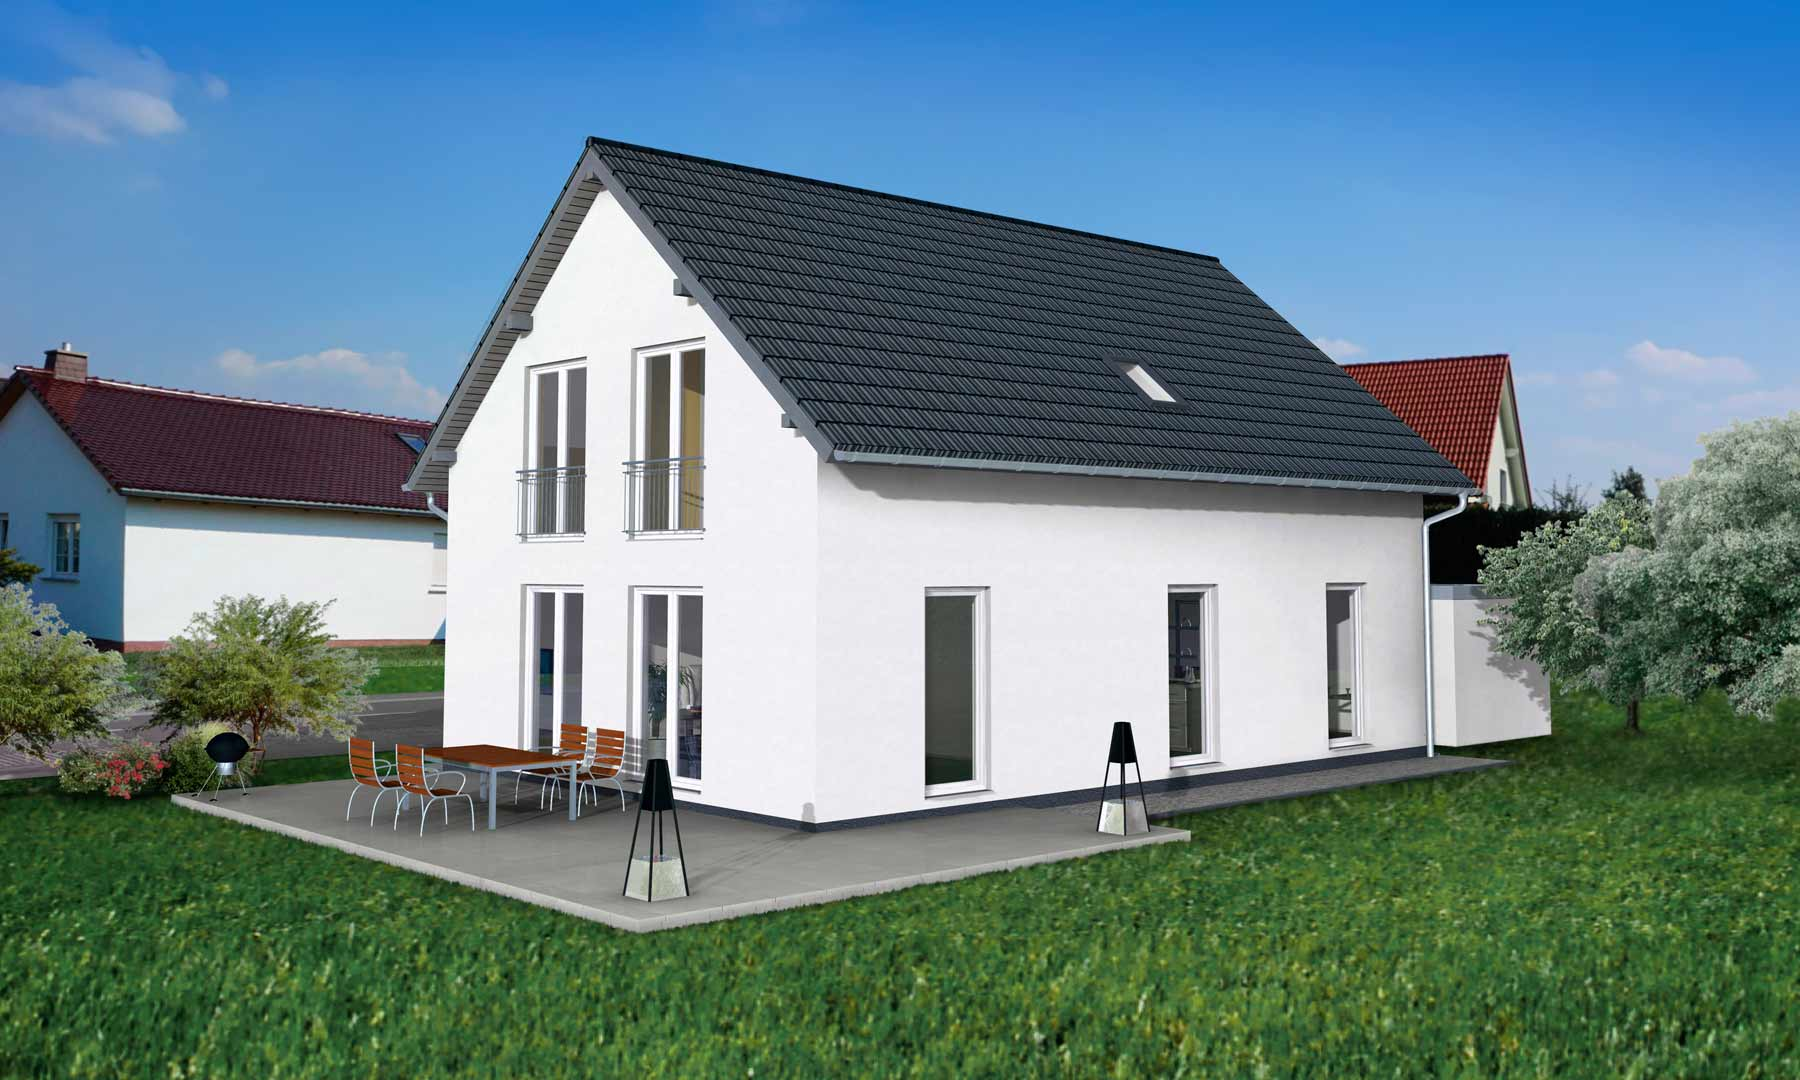 AMB Massivhaus GmbH & Co. KG